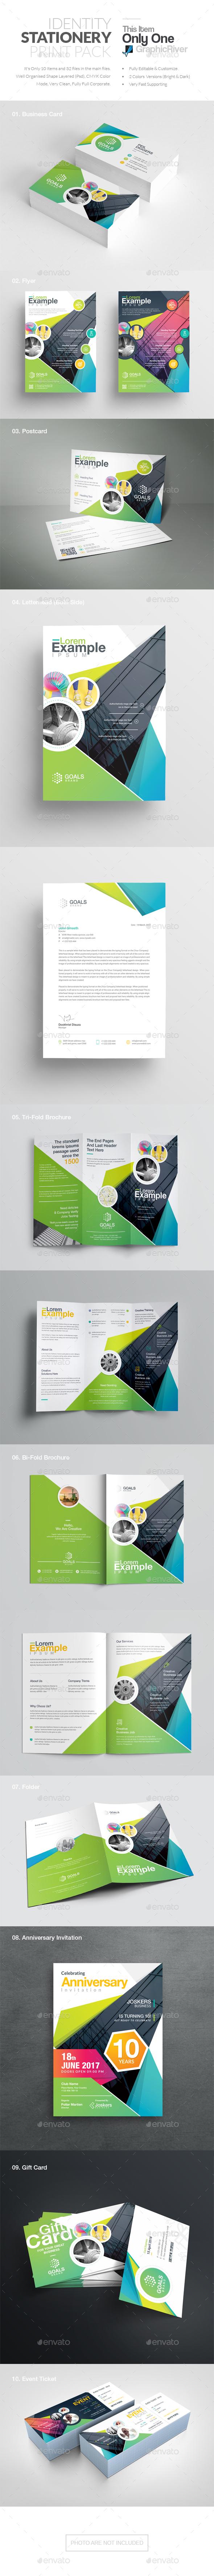 Identity Stationery Print Pack - Stationery Print Templates